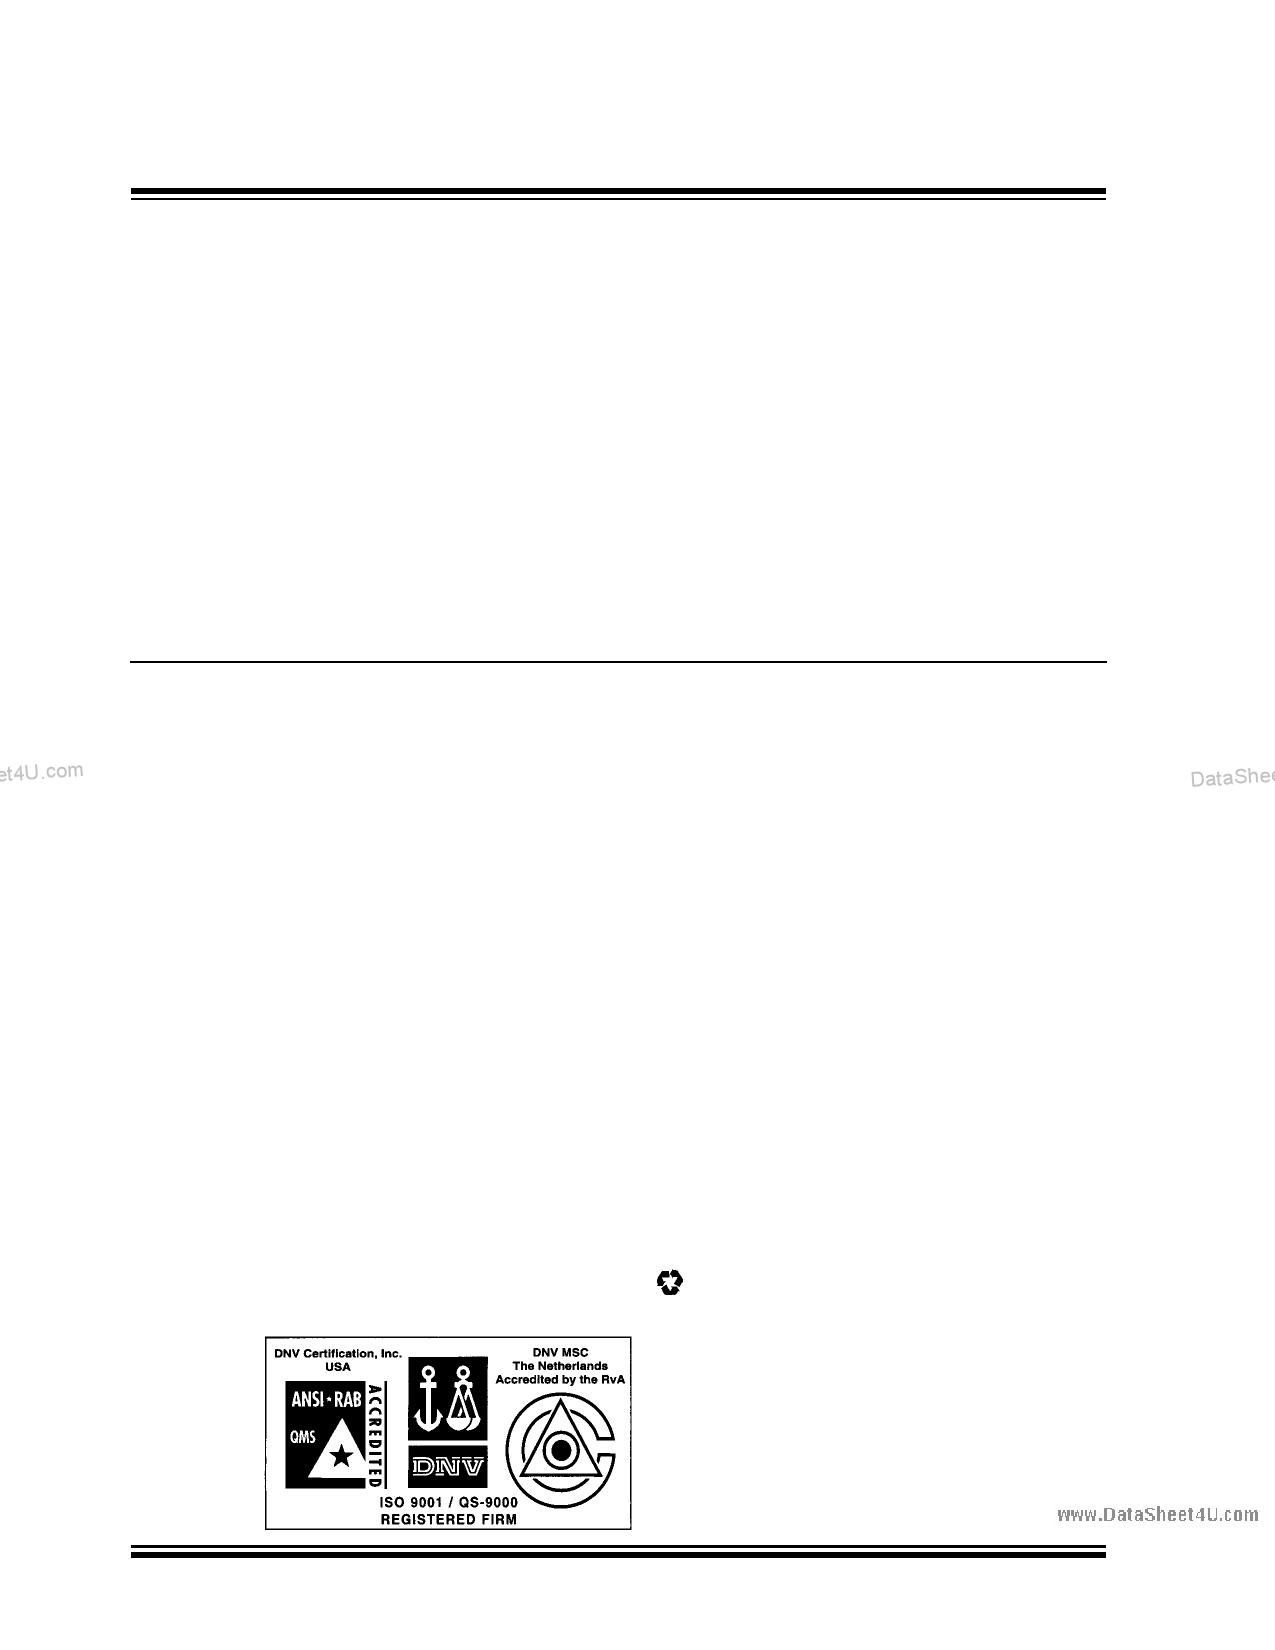 12F629 pdf schematic